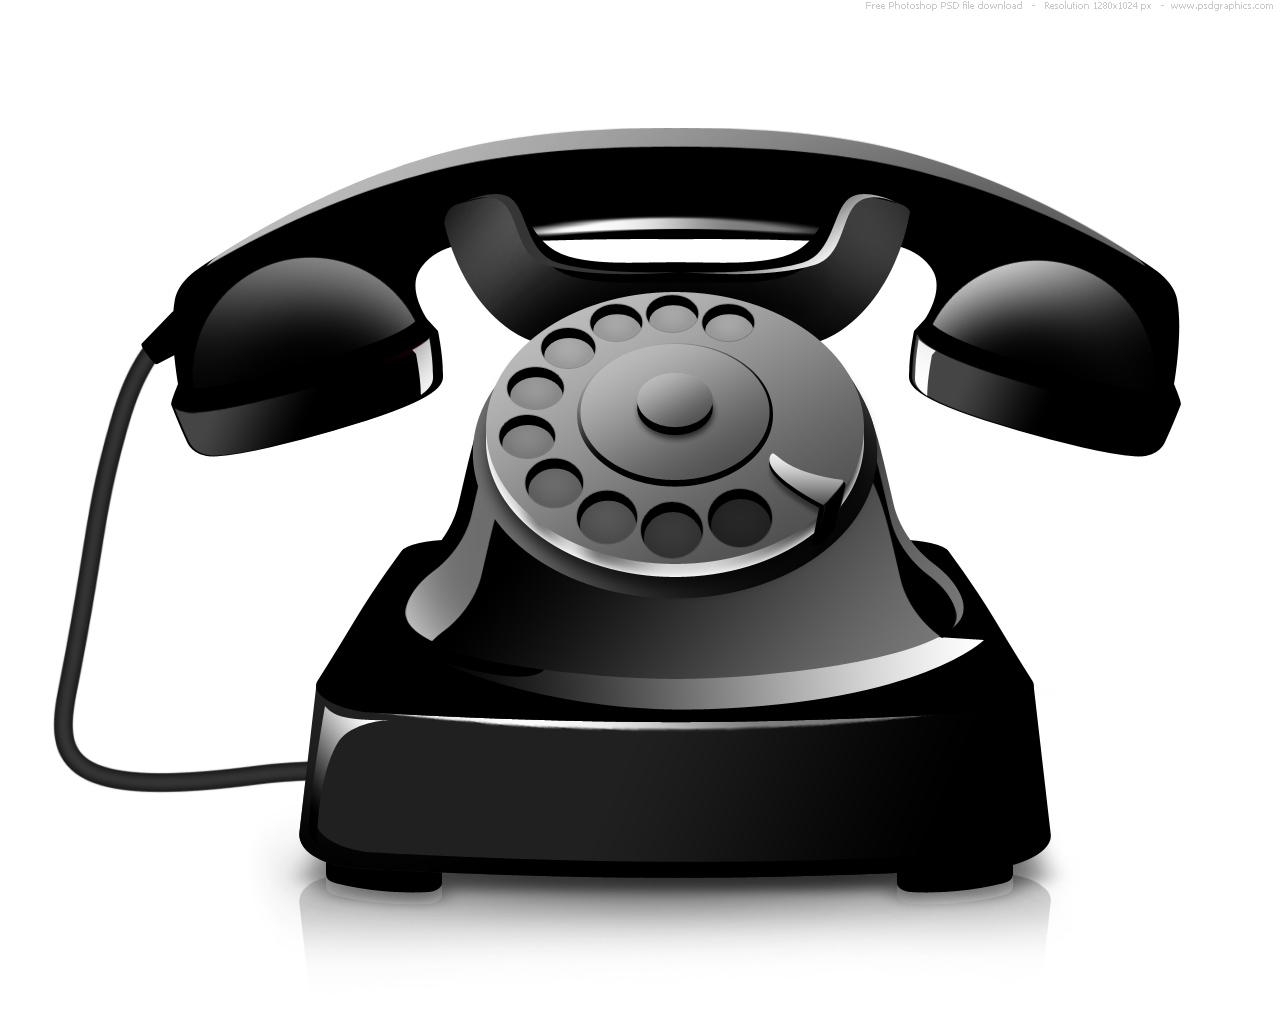 Old Telephone Phone Icon